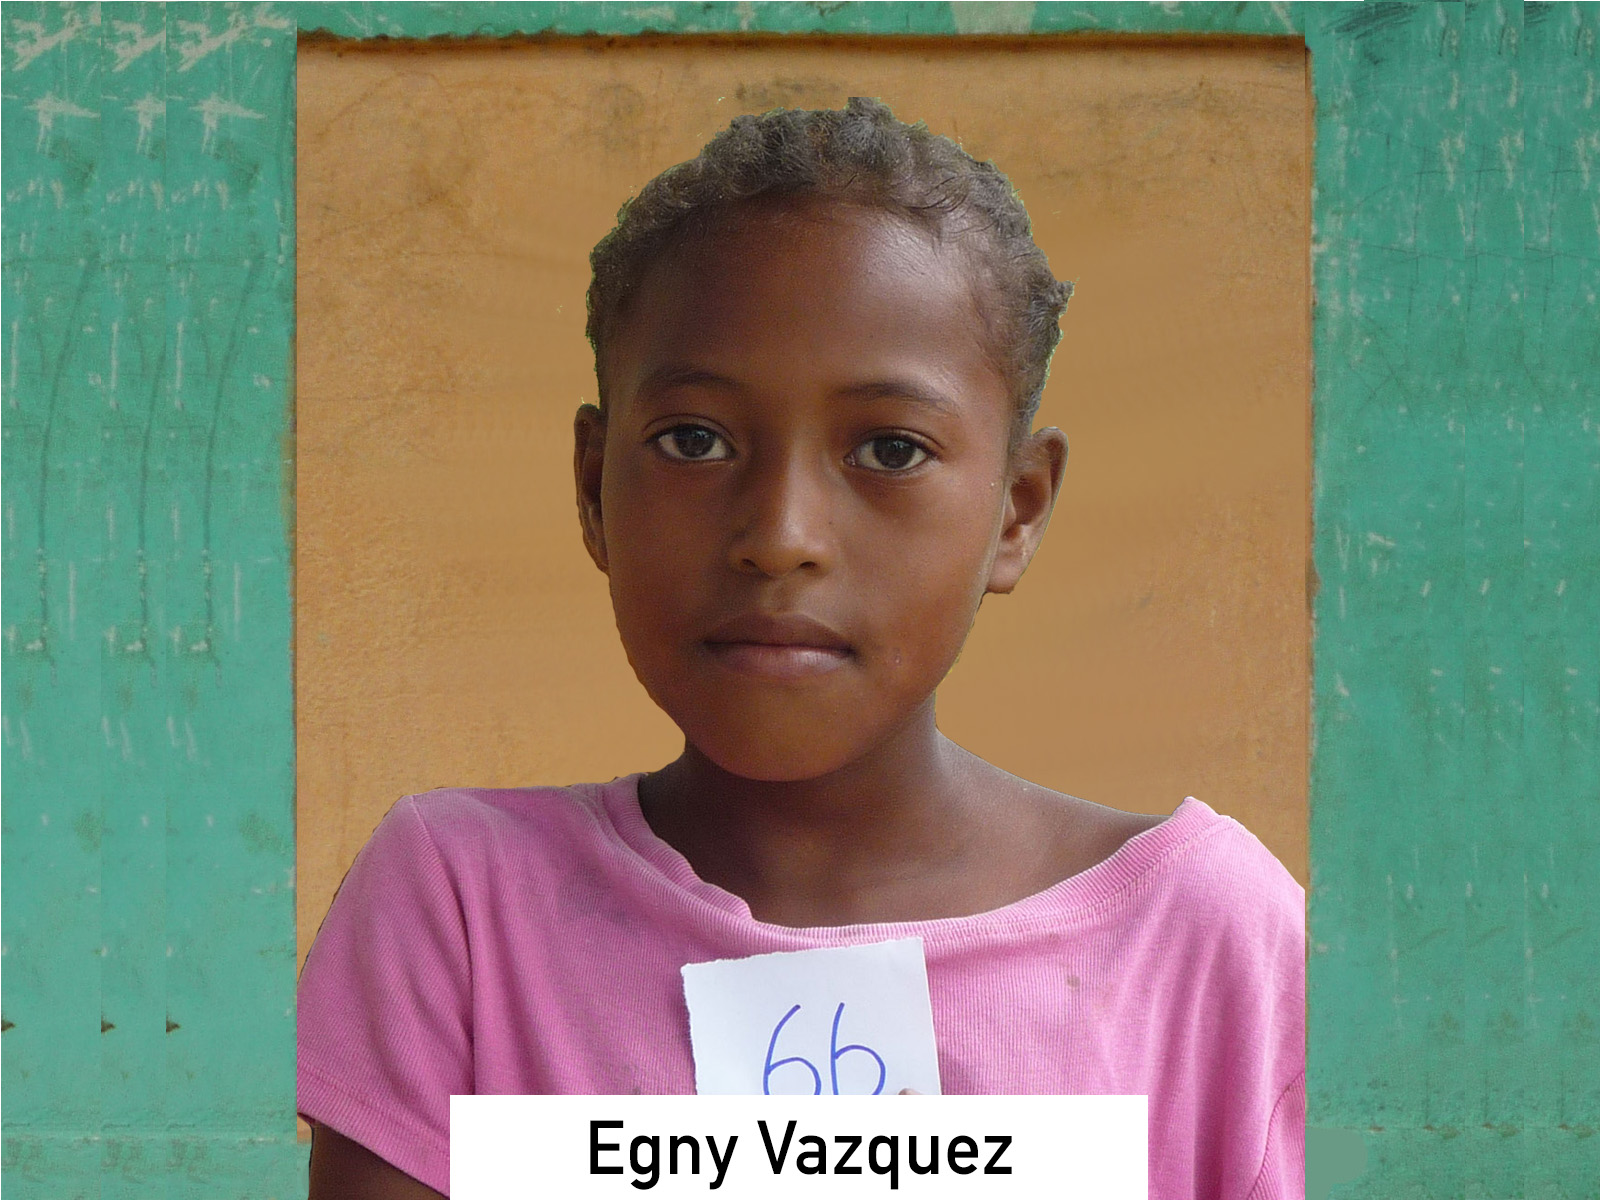 066 - Egny Vazquez.jpg